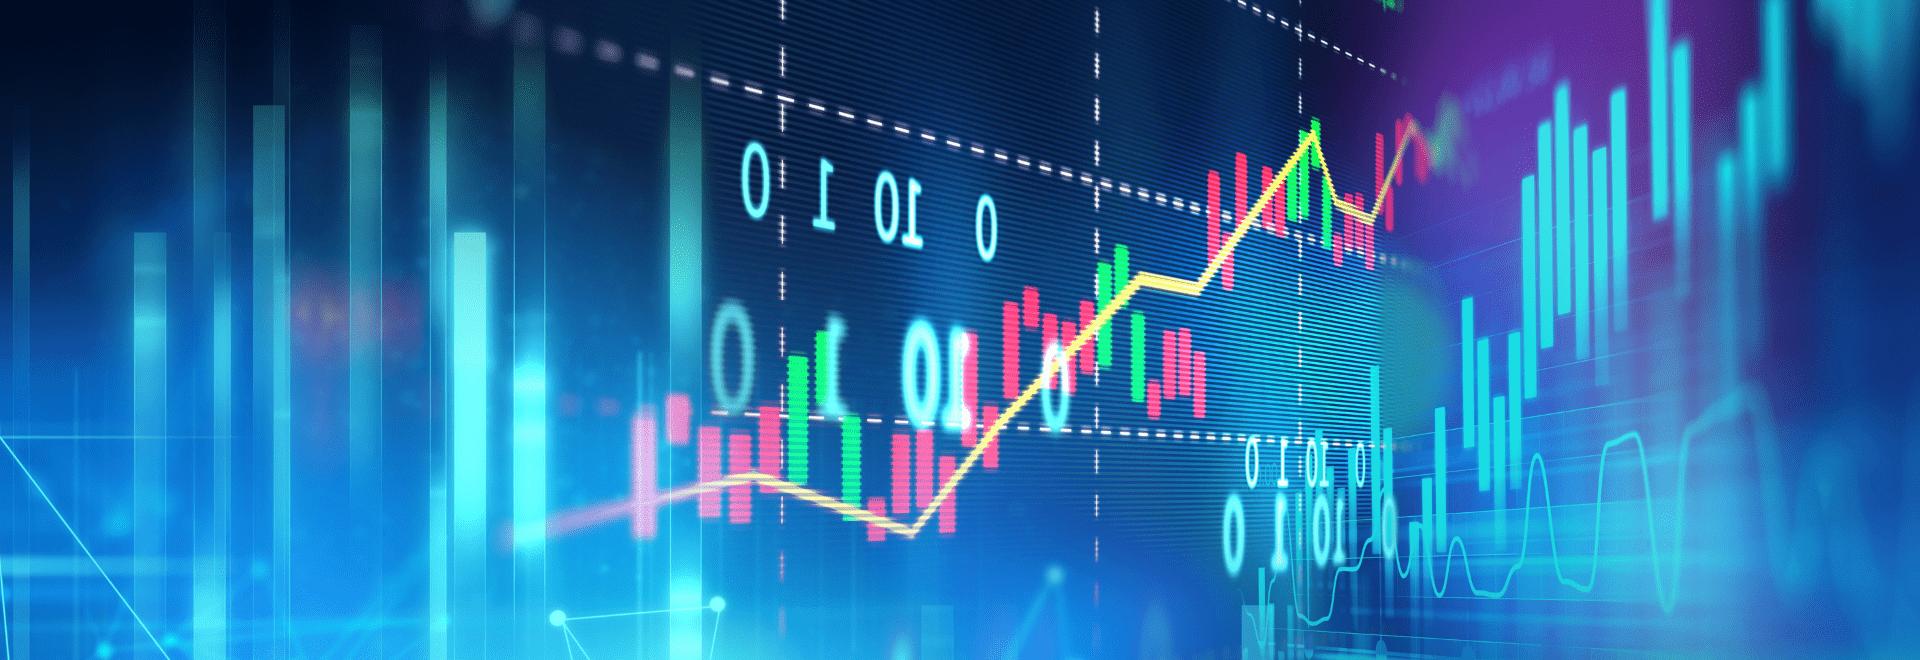 energy markets banner